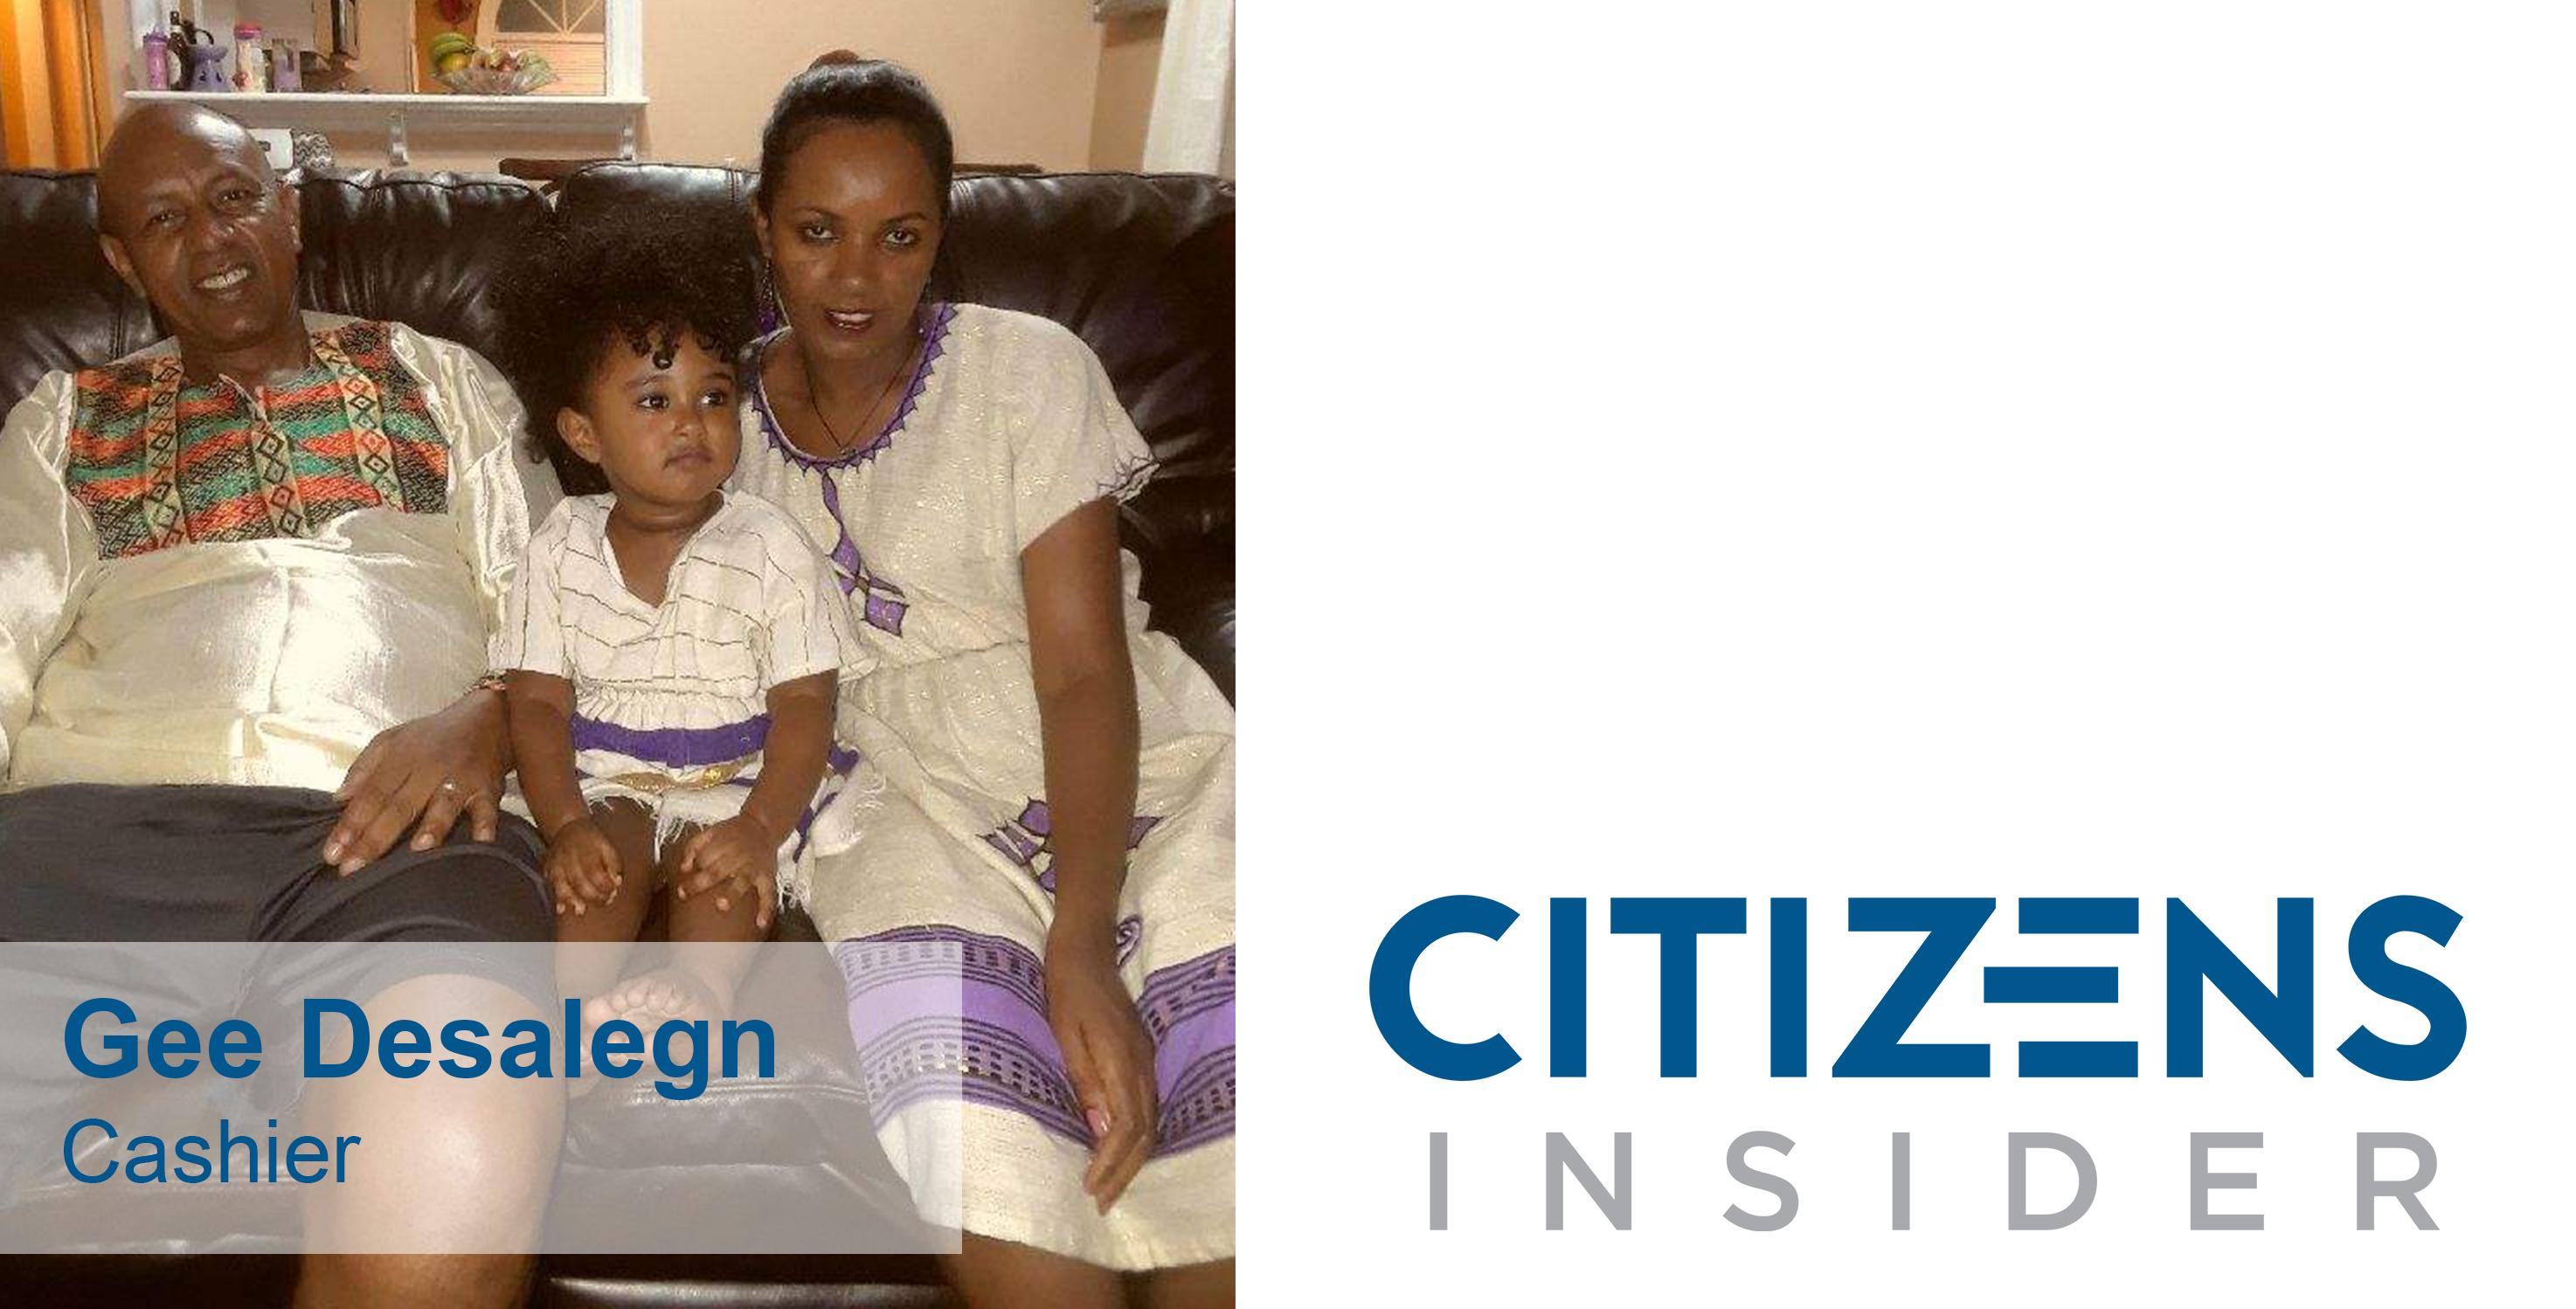 Citizens Insider: Gezhagne Desalegn